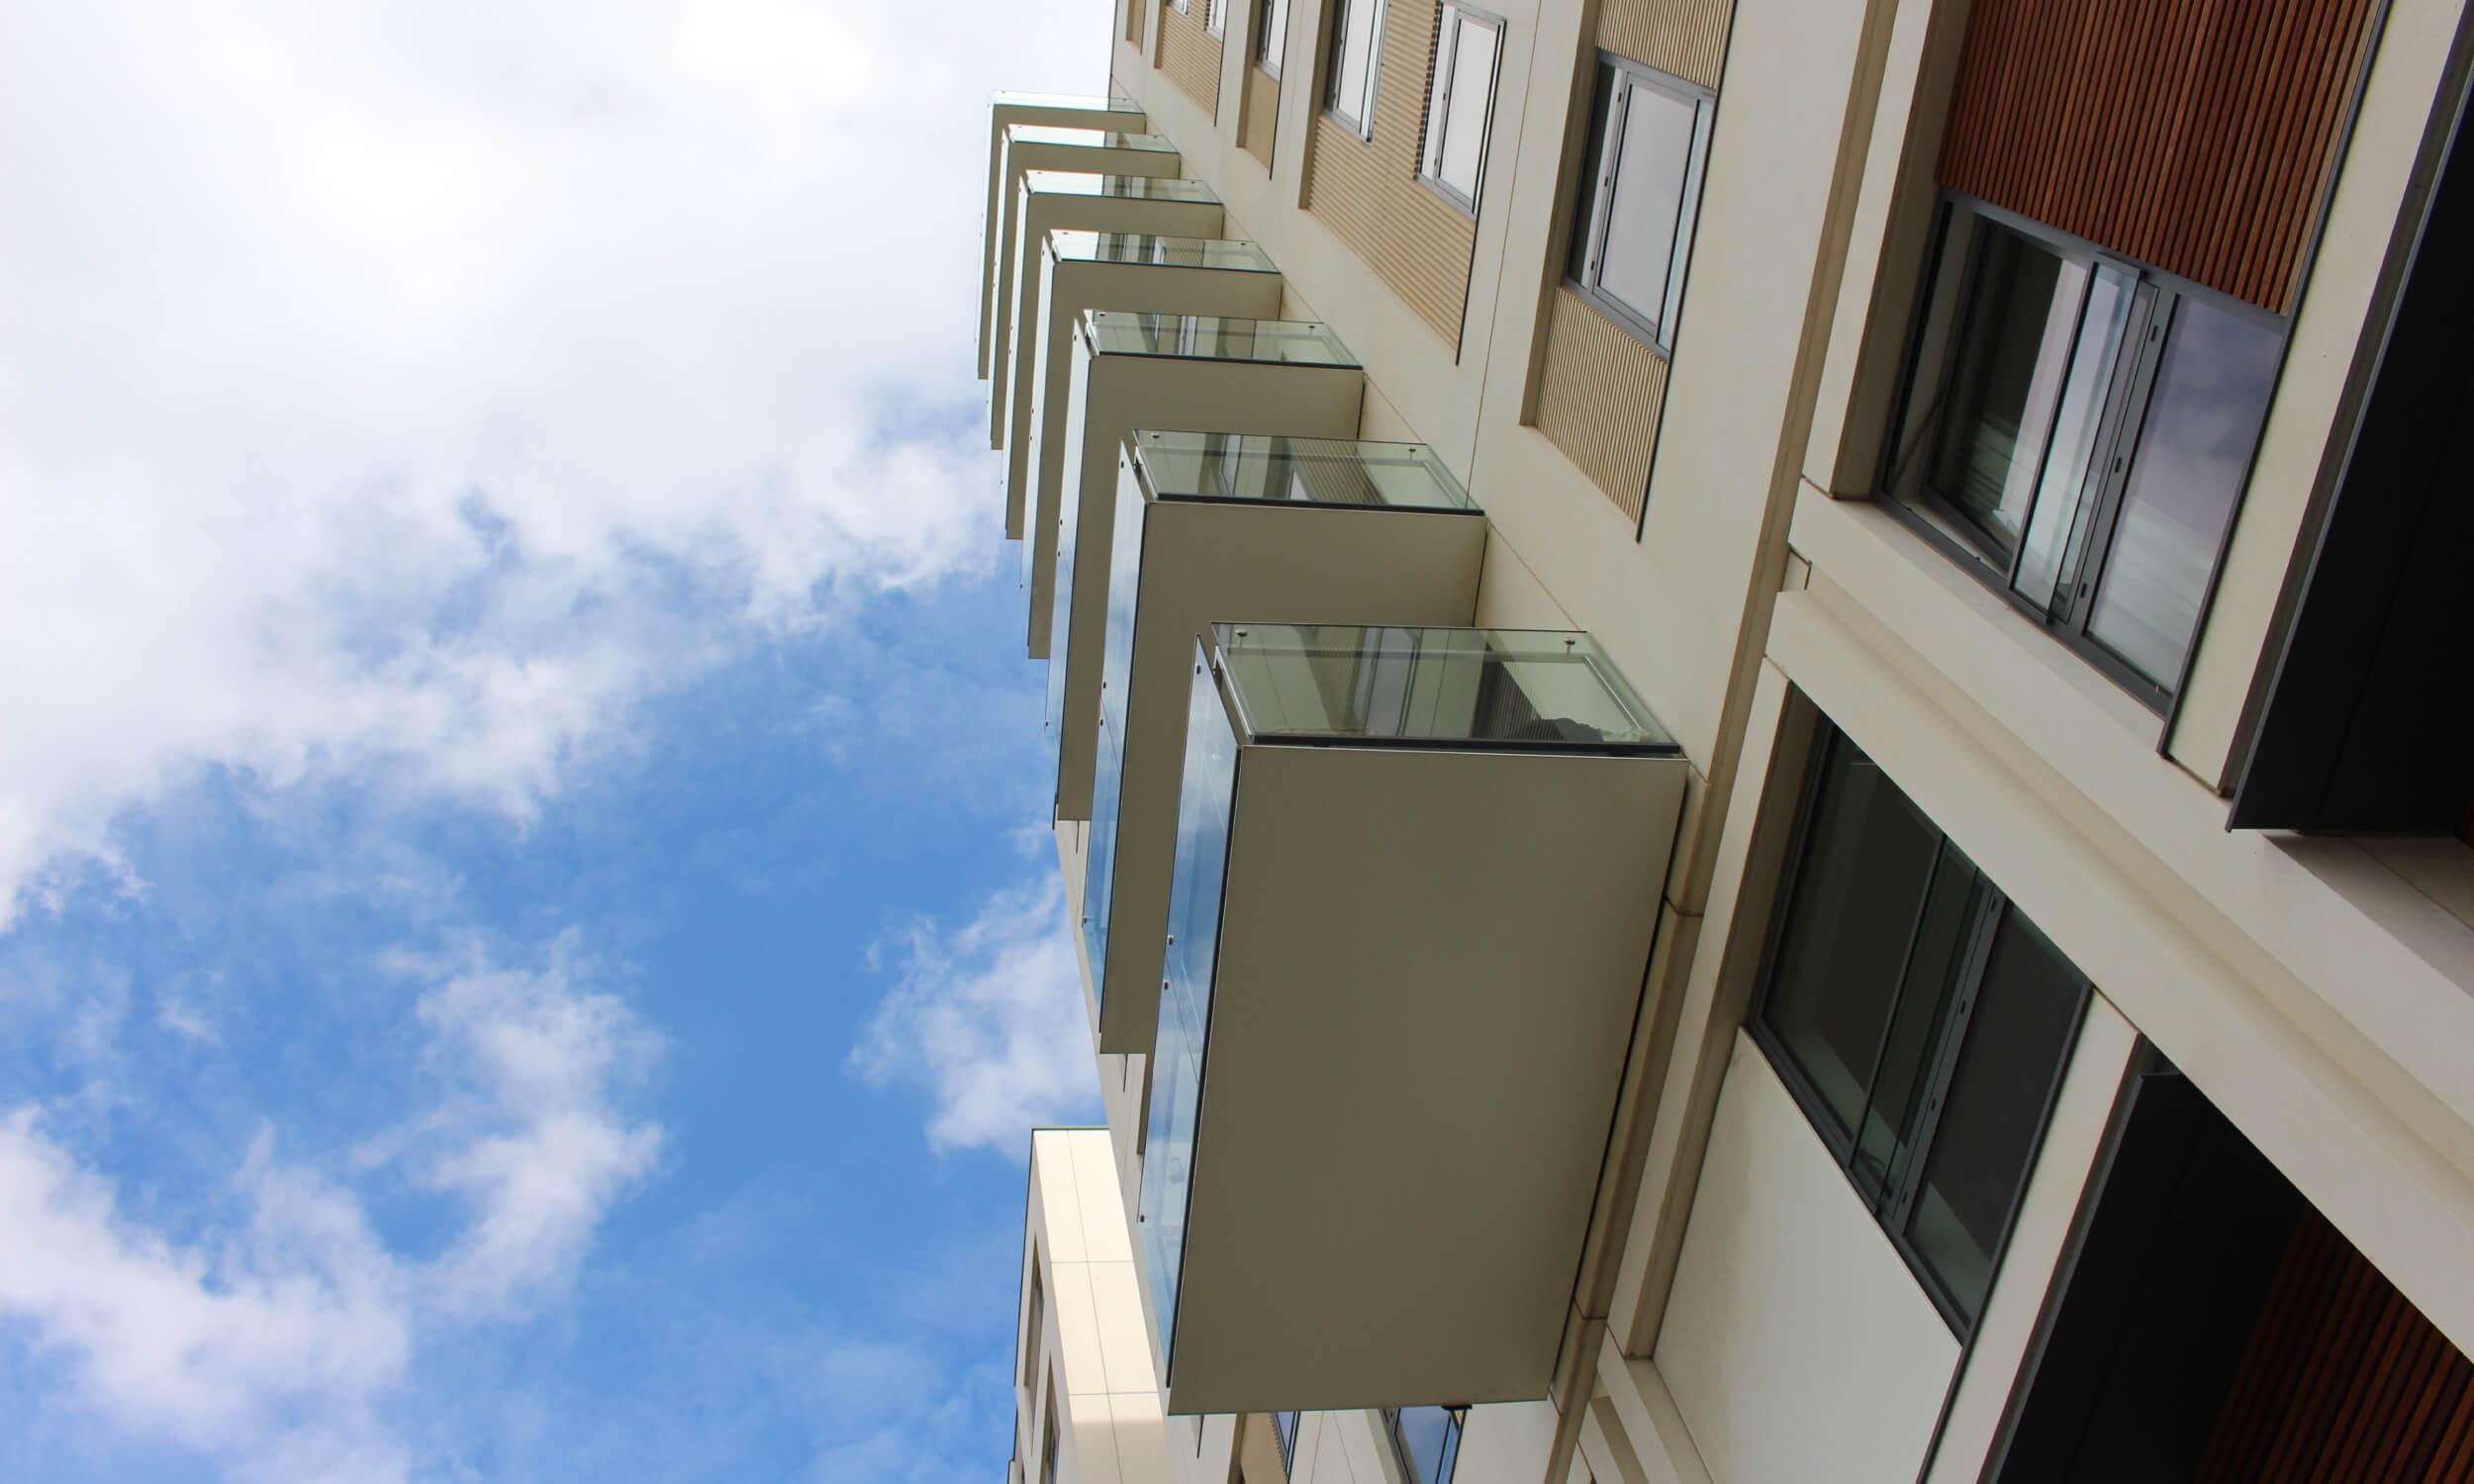 Commercial Building Glass London UK